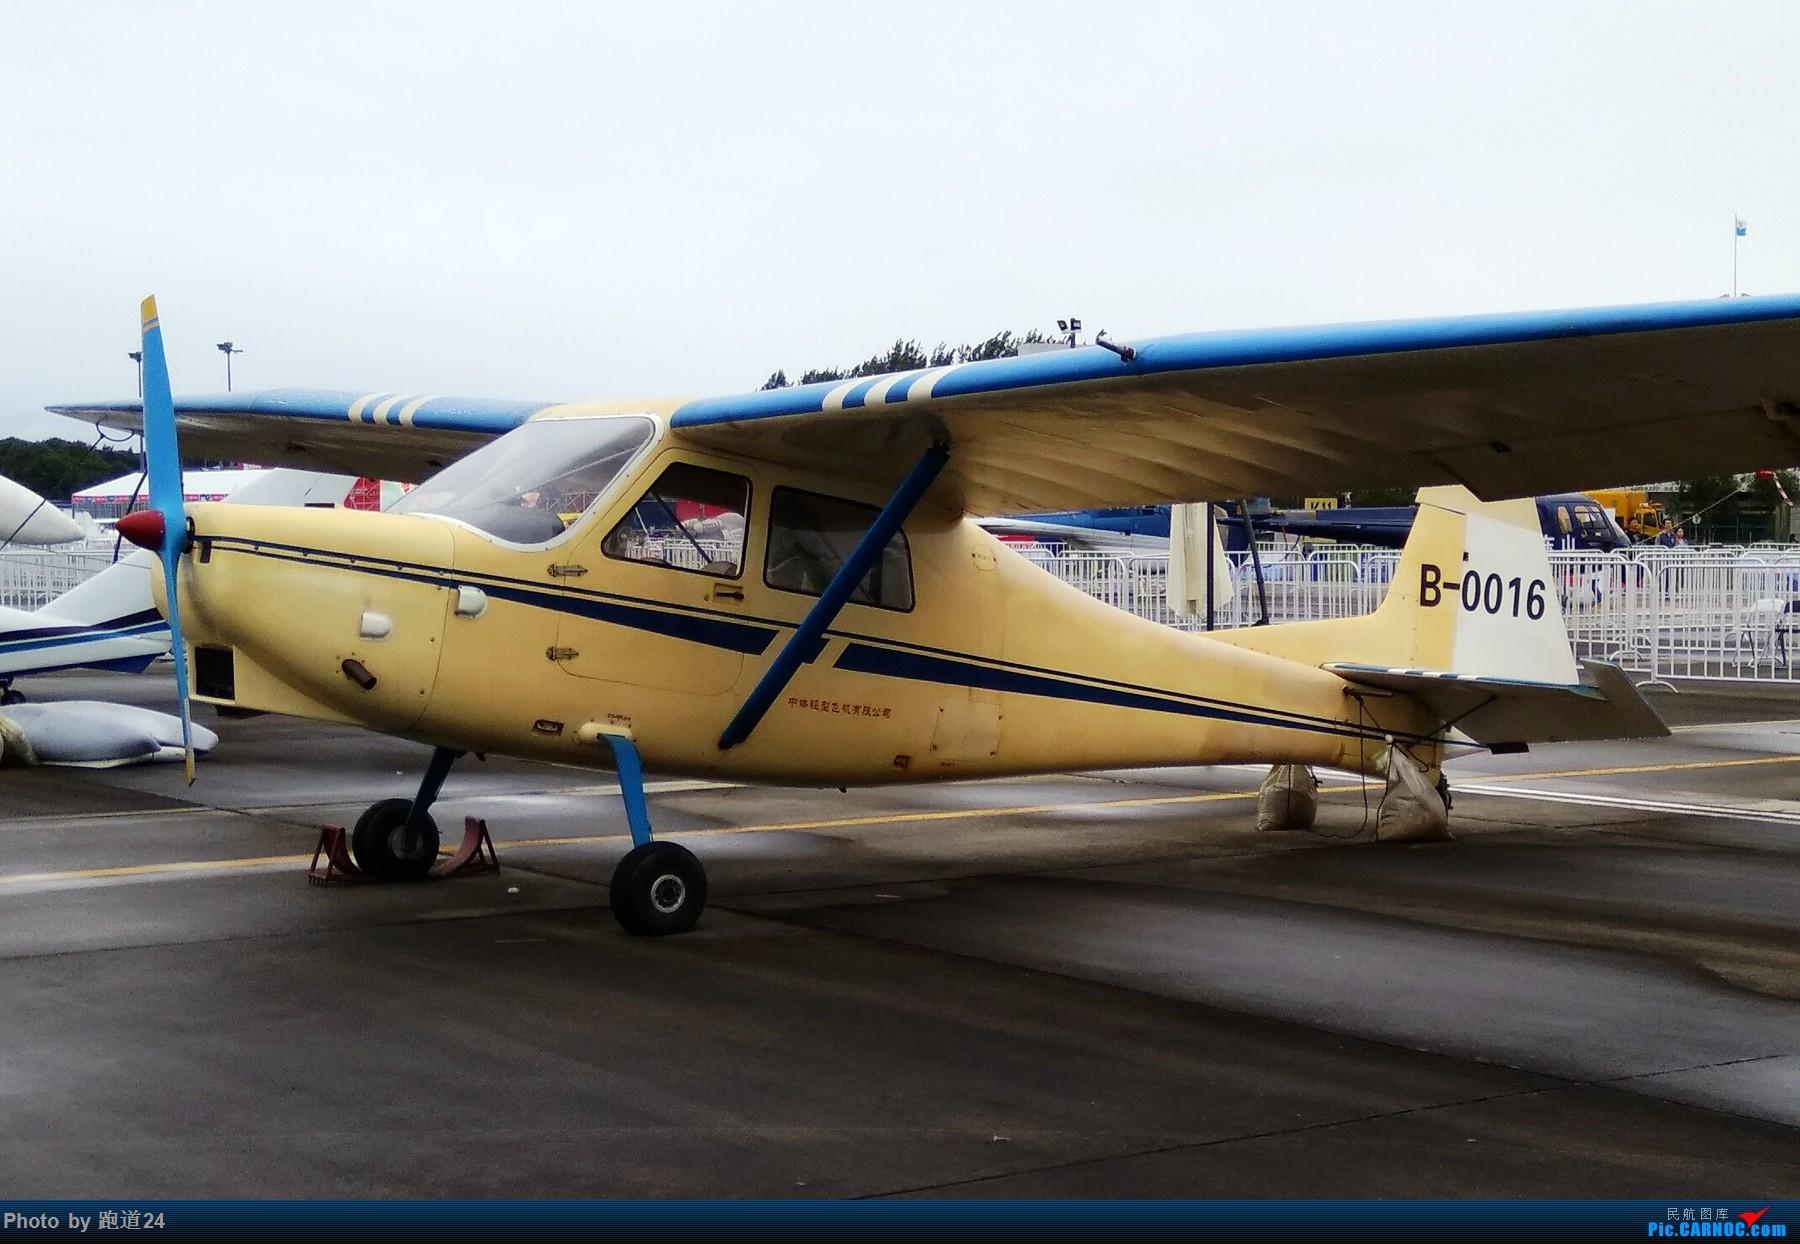 Re:[原创]【多图党】首次参观航展 B-0016 B-0016 中国广汉机场